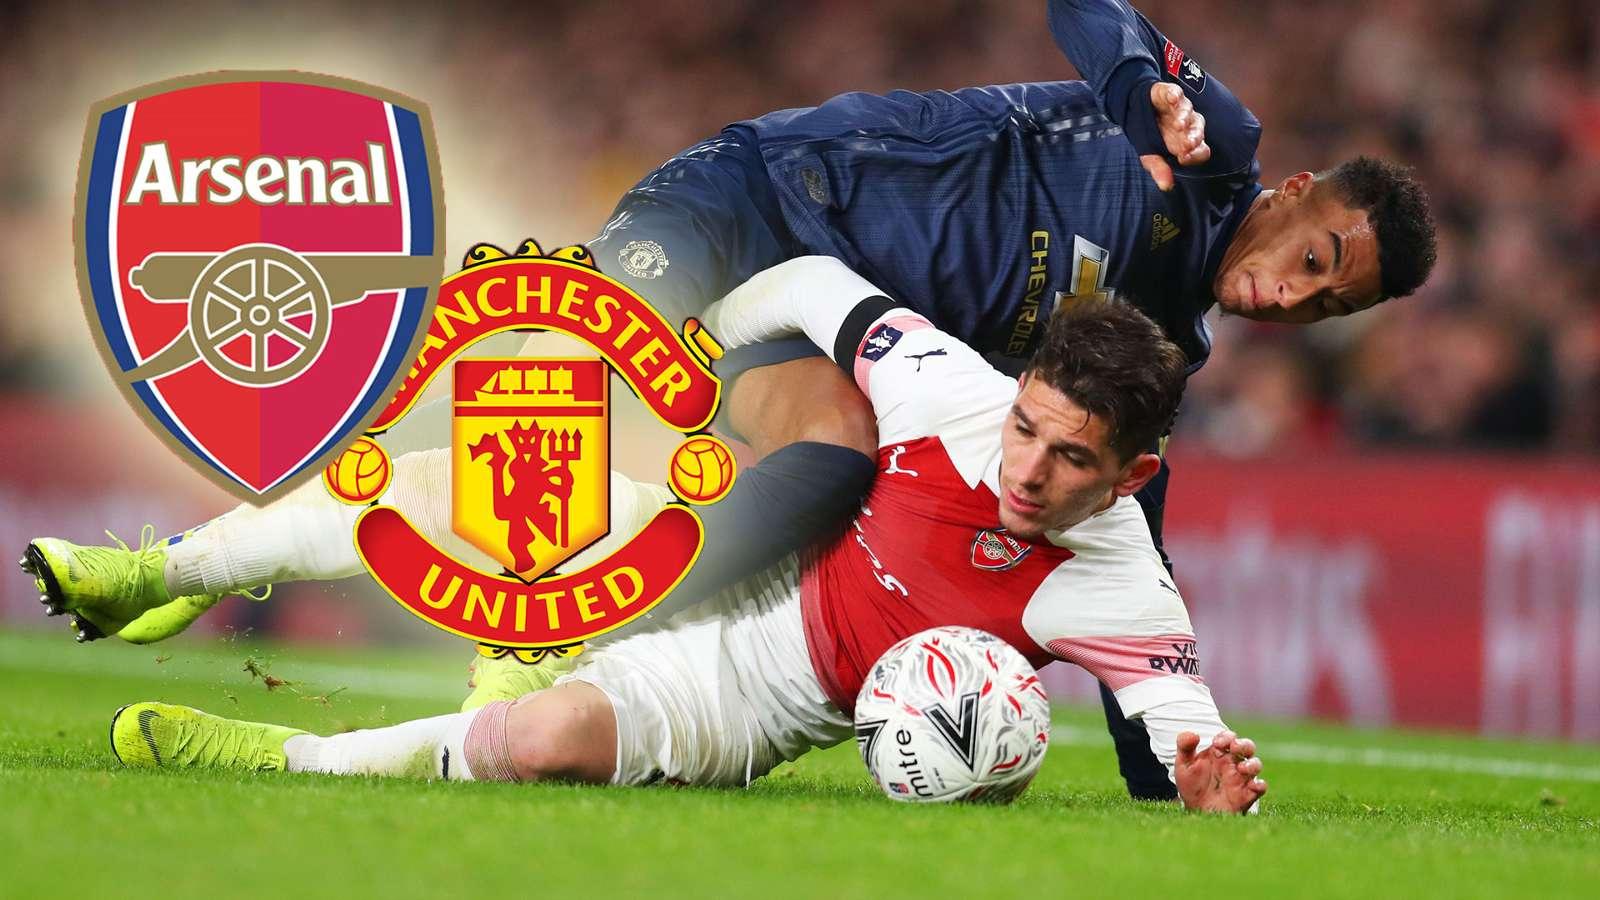 Prediksi Susunan Pemain Arsenal vs Manchester United